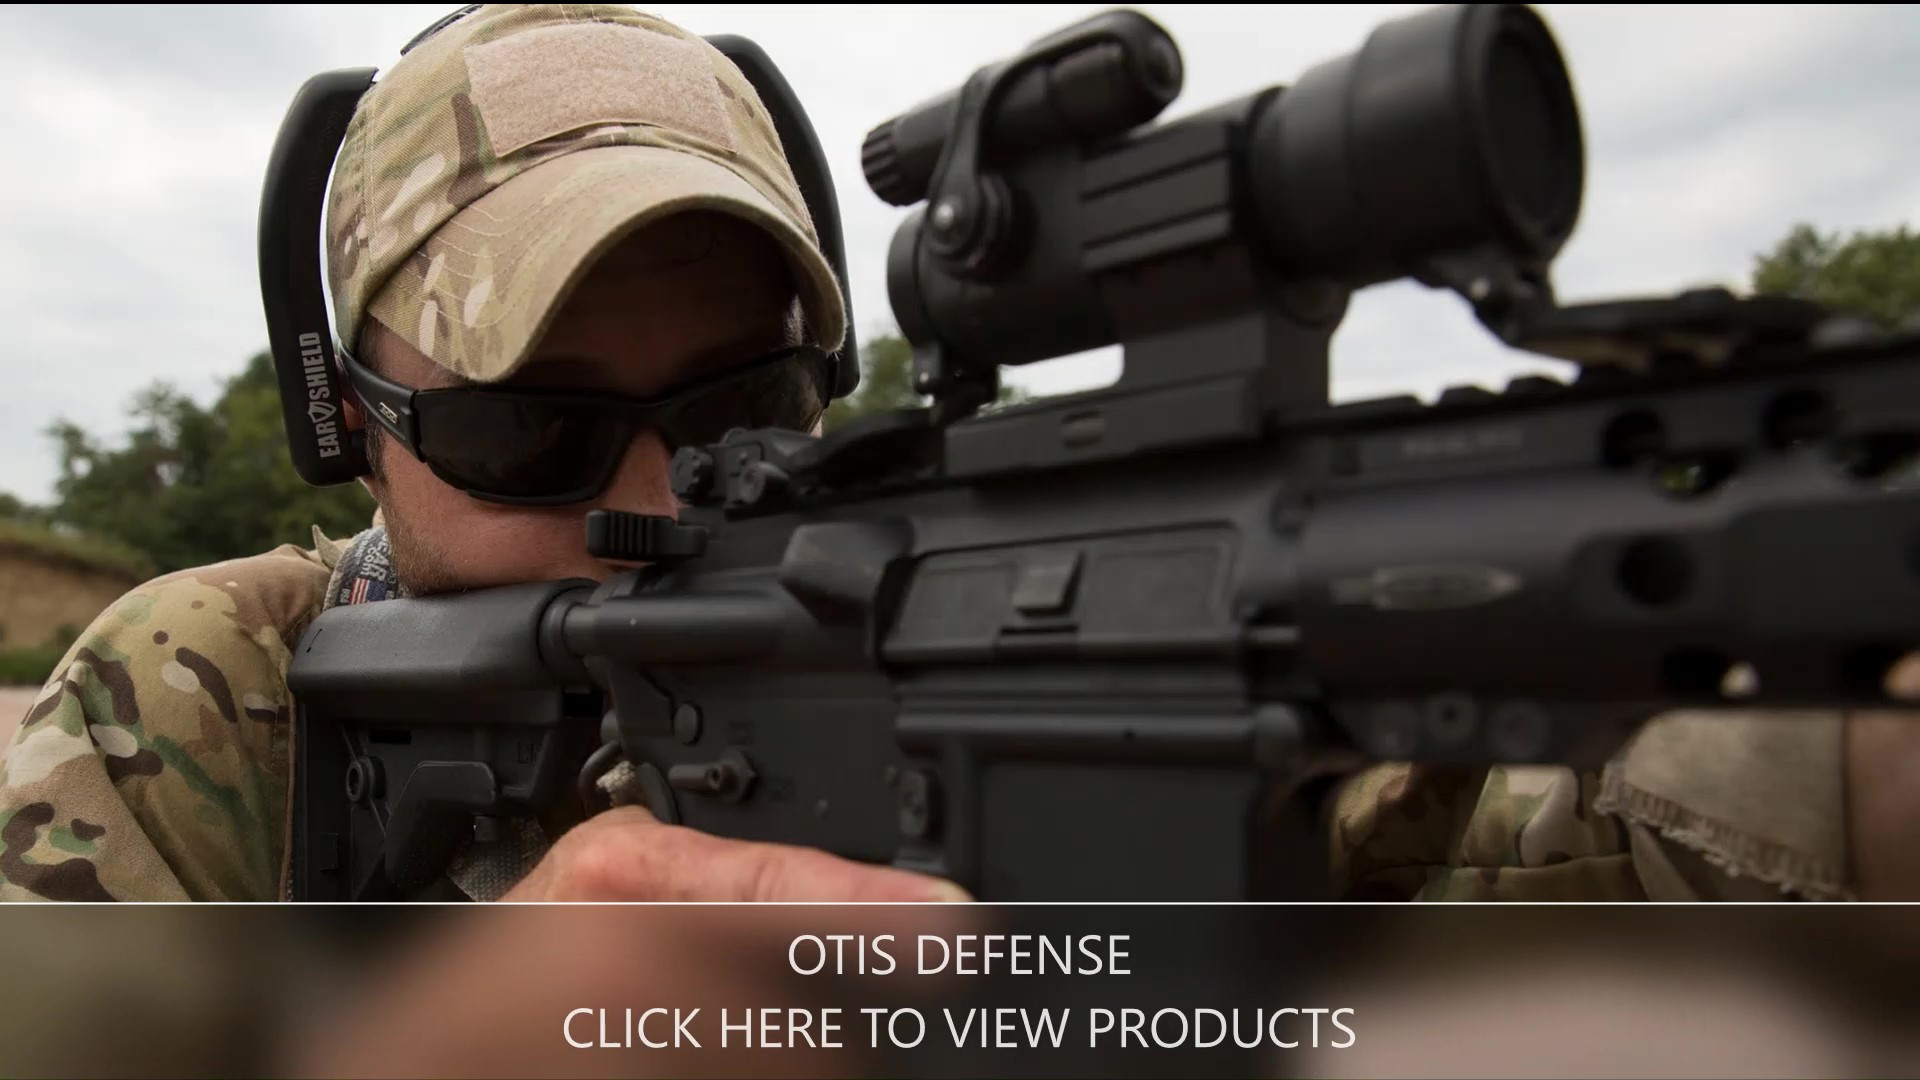 https://otisdefense.com/